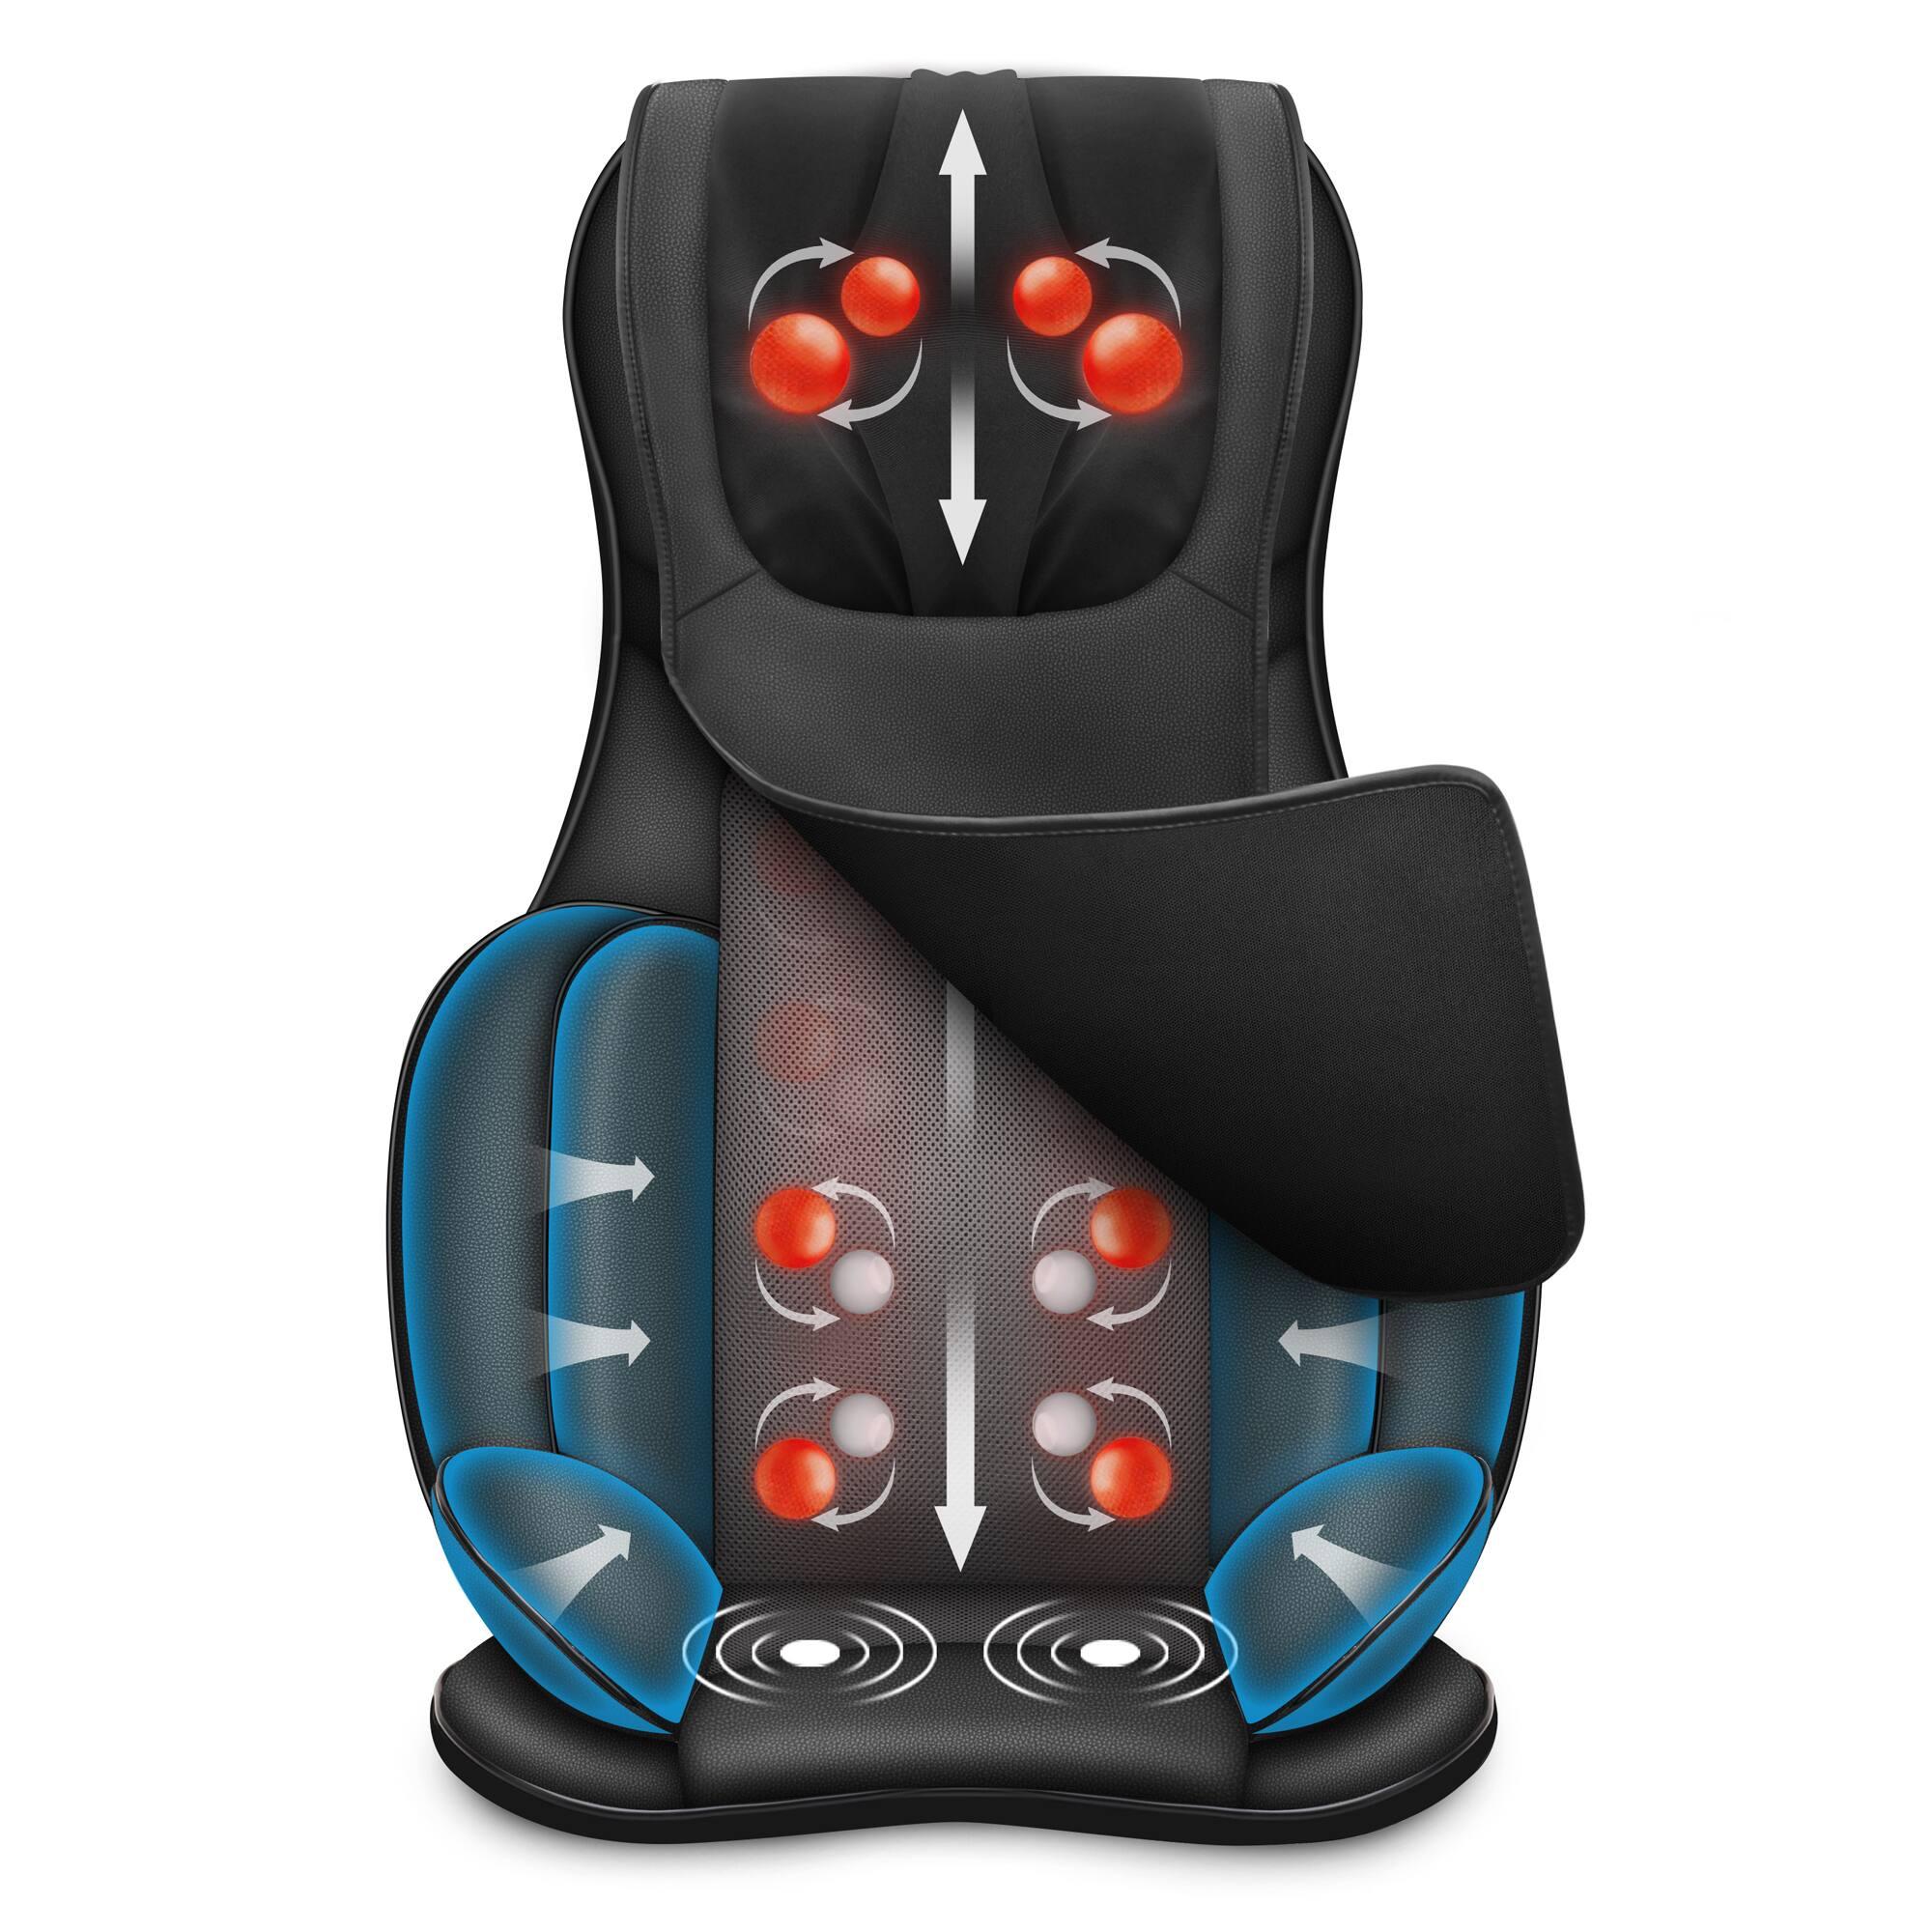 SNAILAX Air Compression Full Body Shiatsu Massager Kneading Cushion w/ Heat - $149.99 + Free Shipping